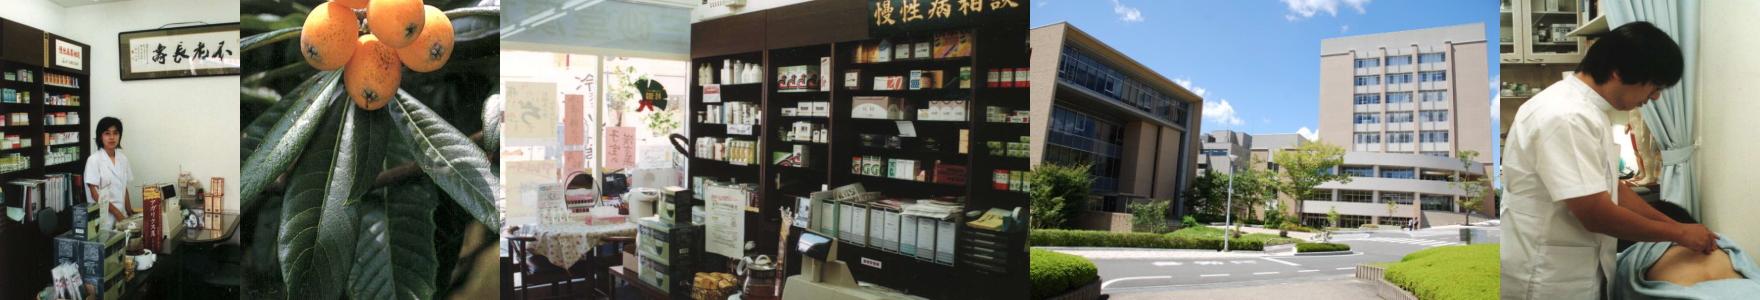 健康、美容鍼灸の三砂堂漢方